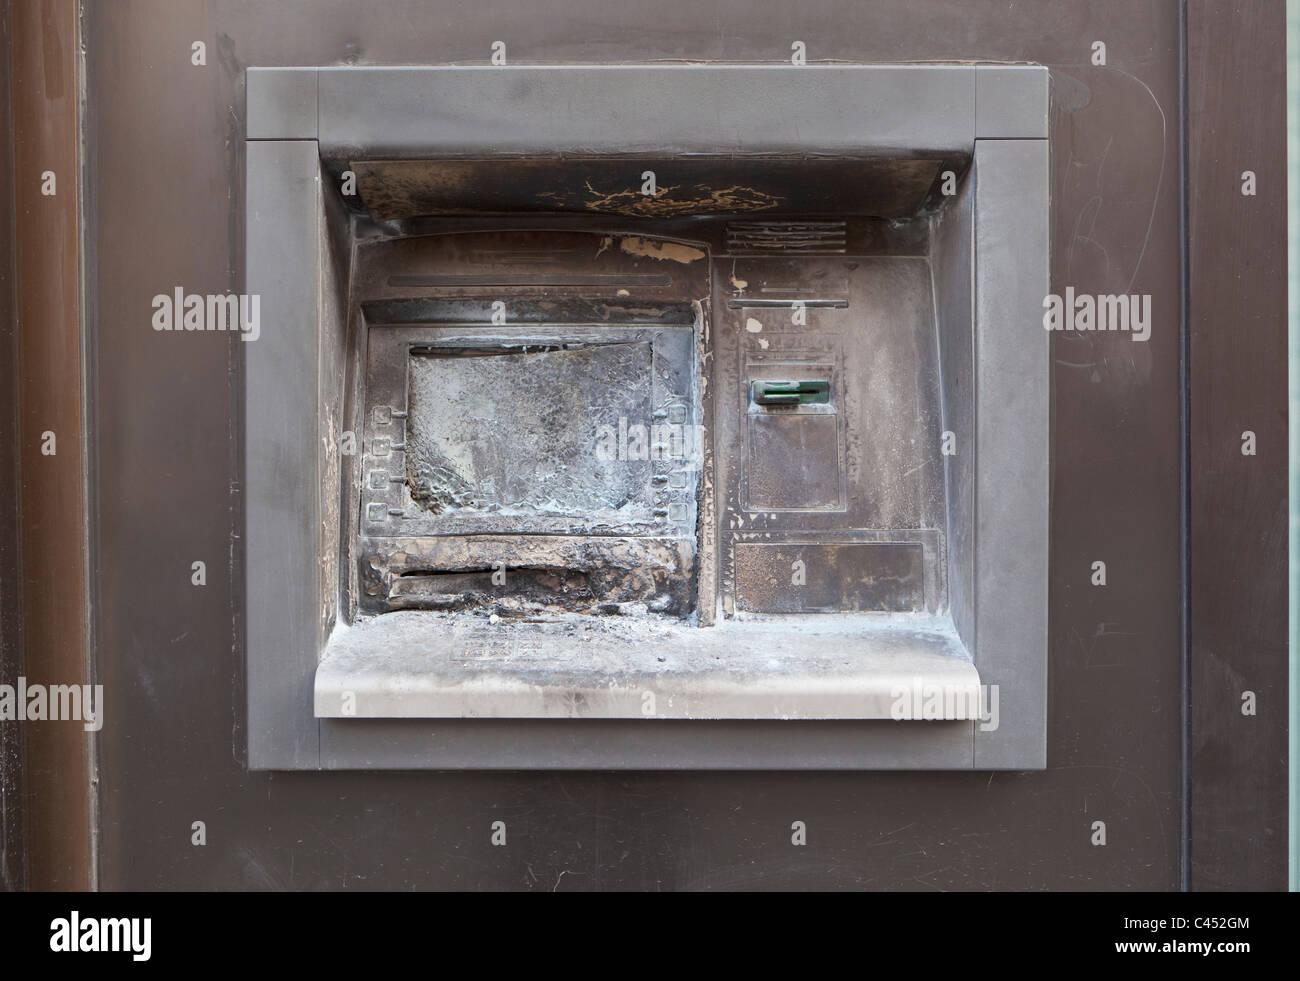 vandalized atm cash machine - Stock Image